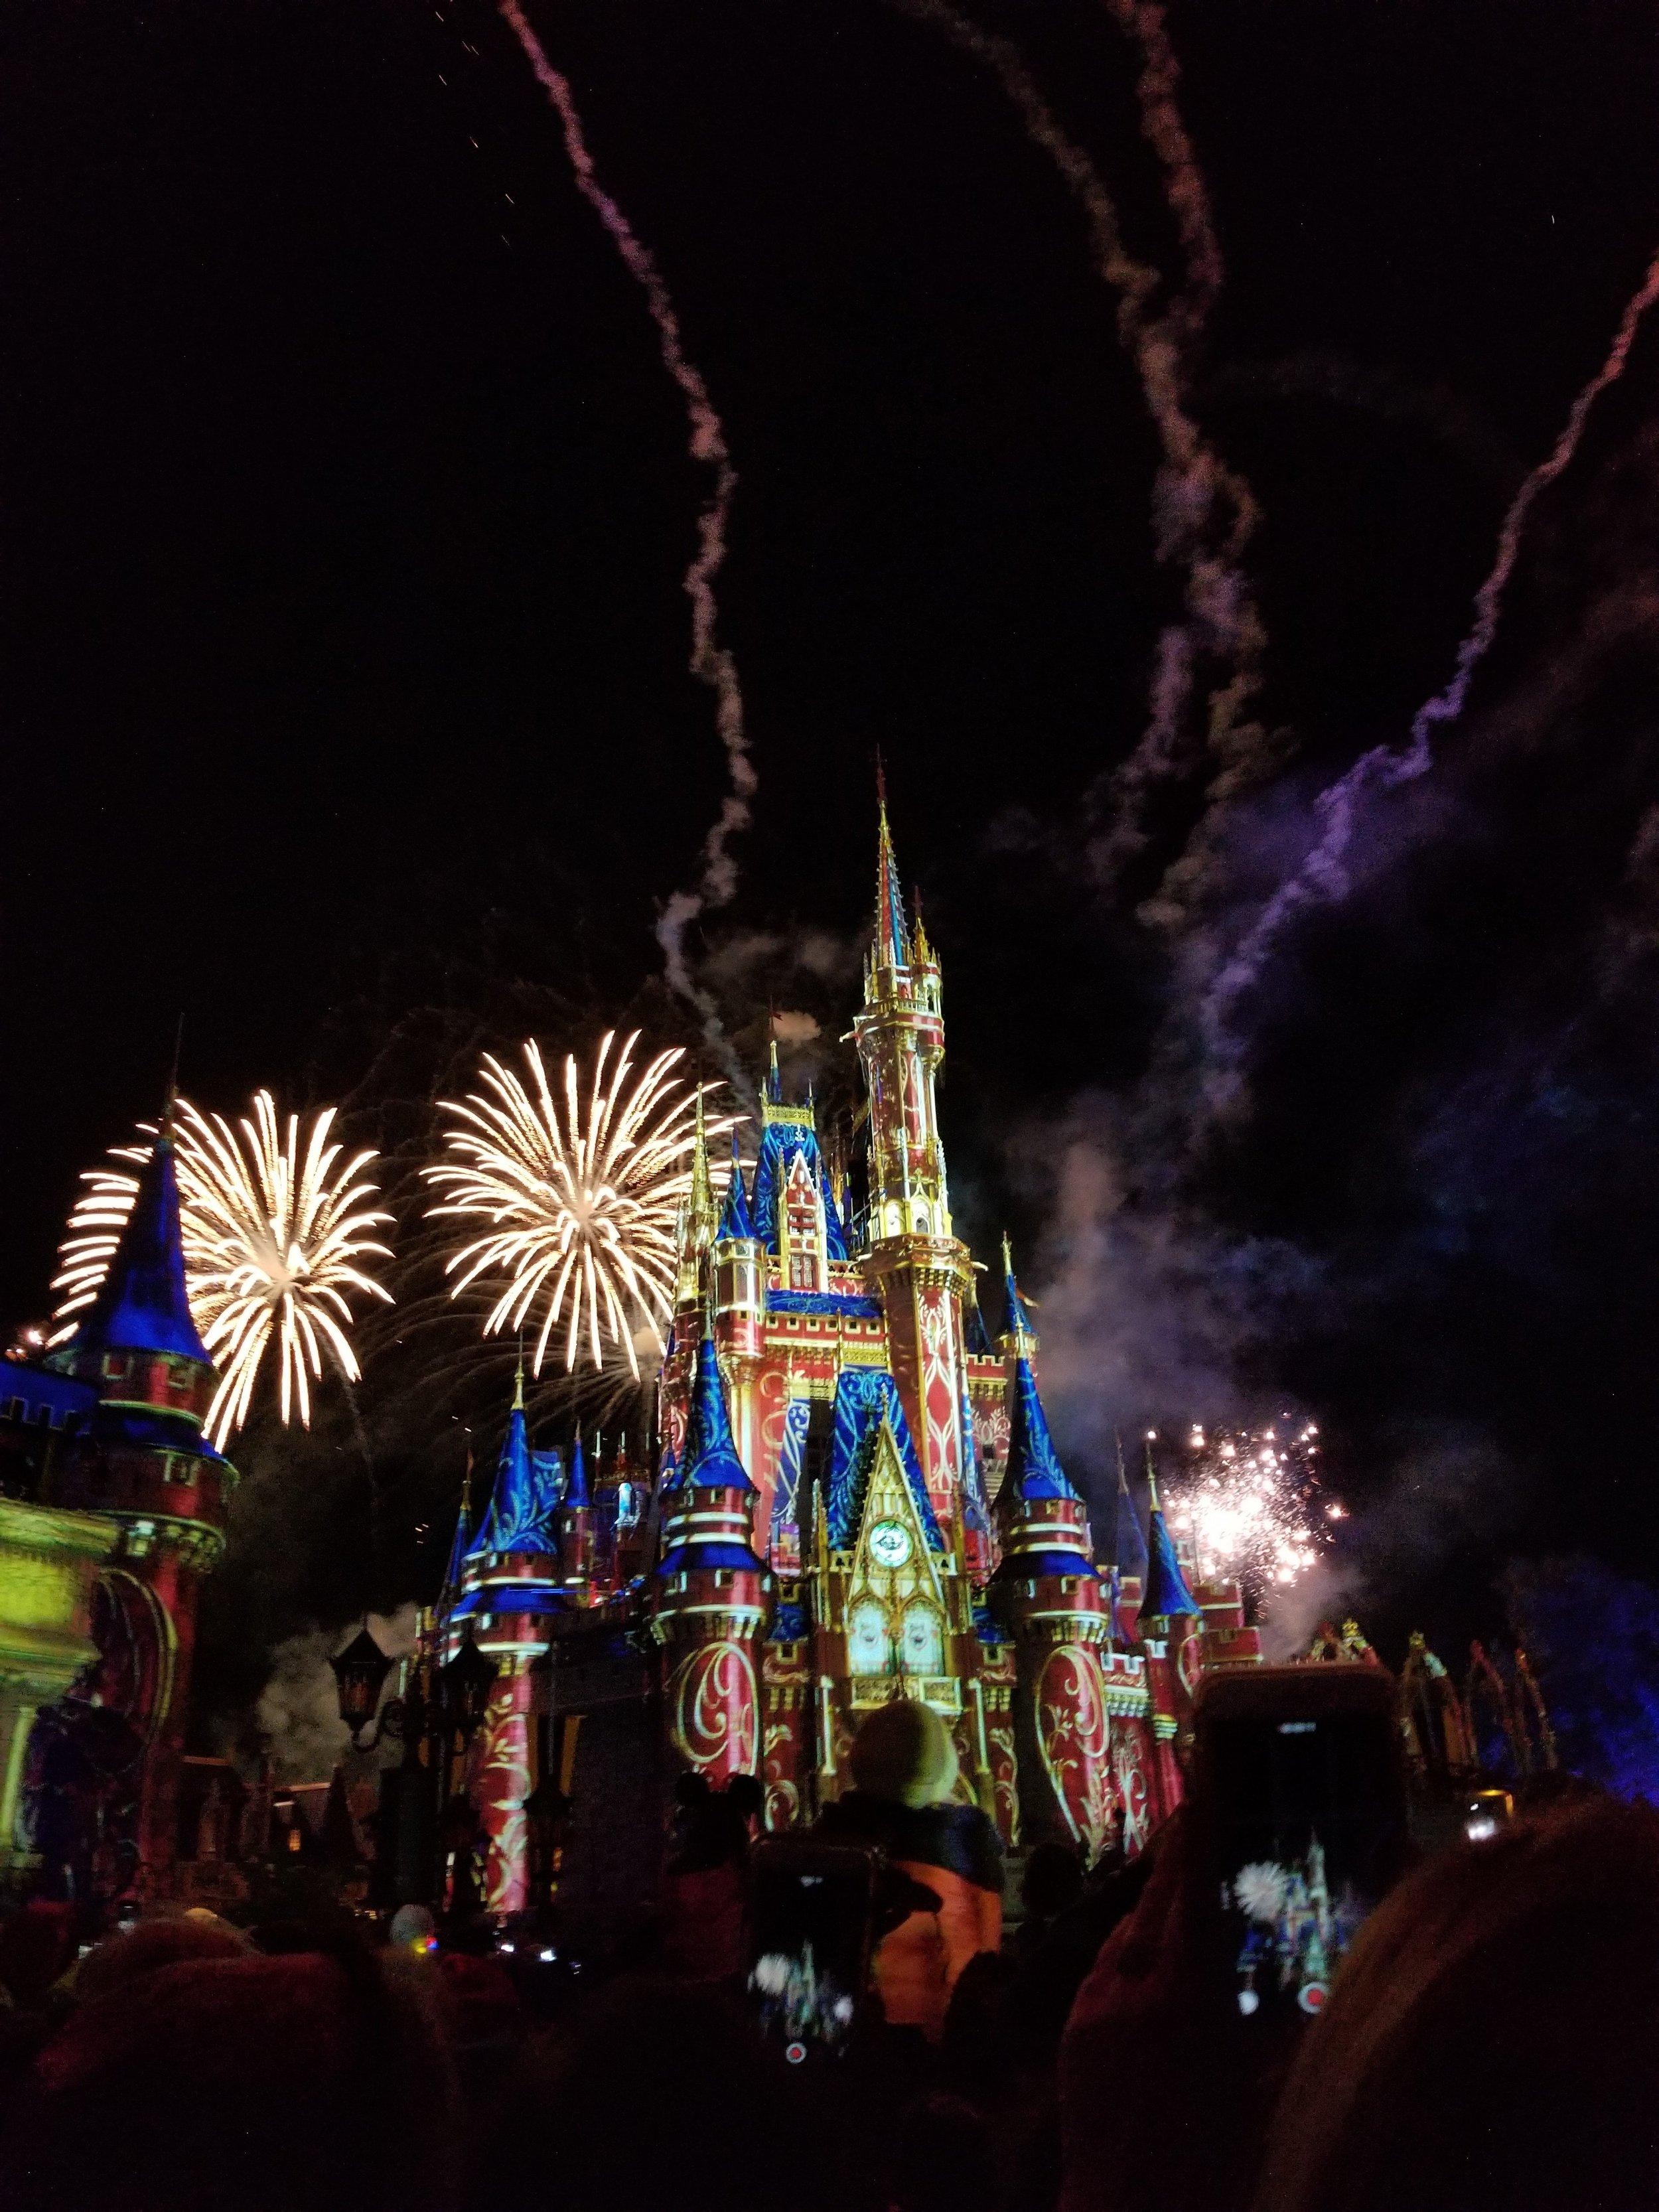 architecture-castle-celebration-879844.jpg